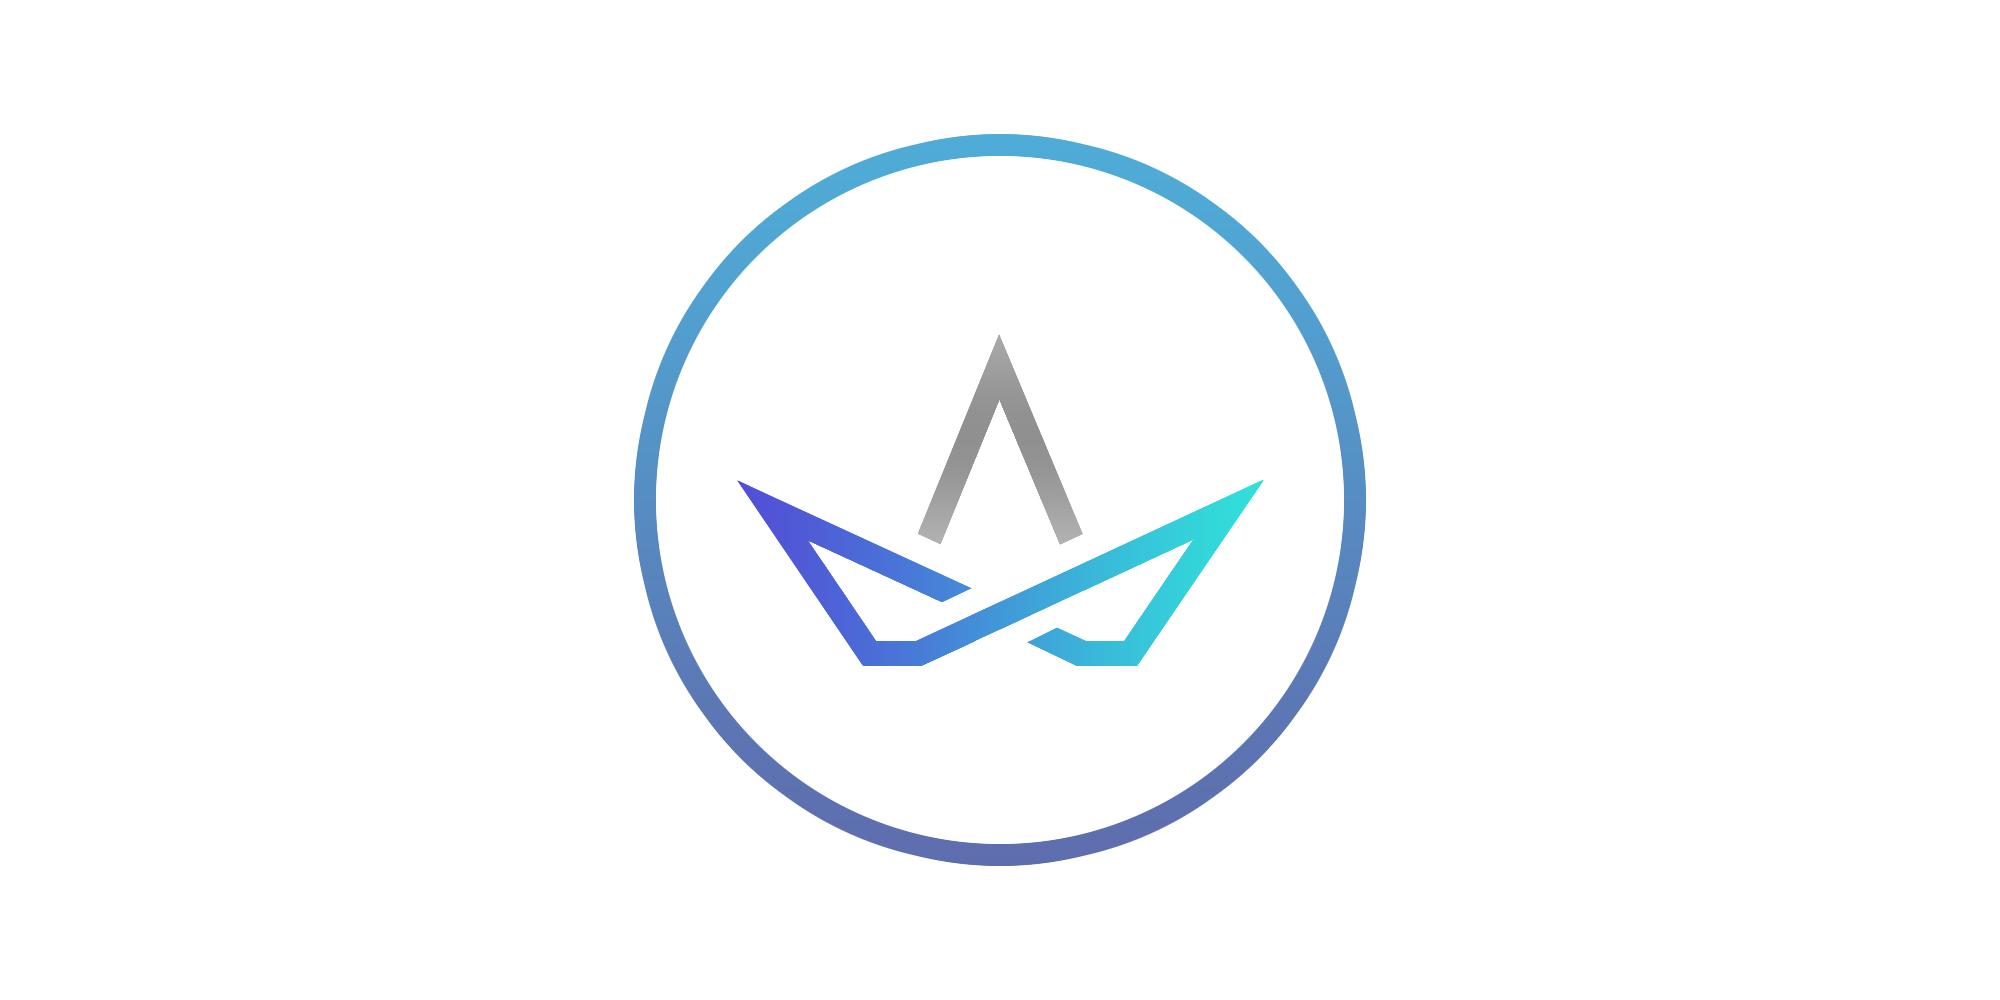 https://seoraz.com/wp-content/plugins/kingcomposer/assets/images/get_start.jpg